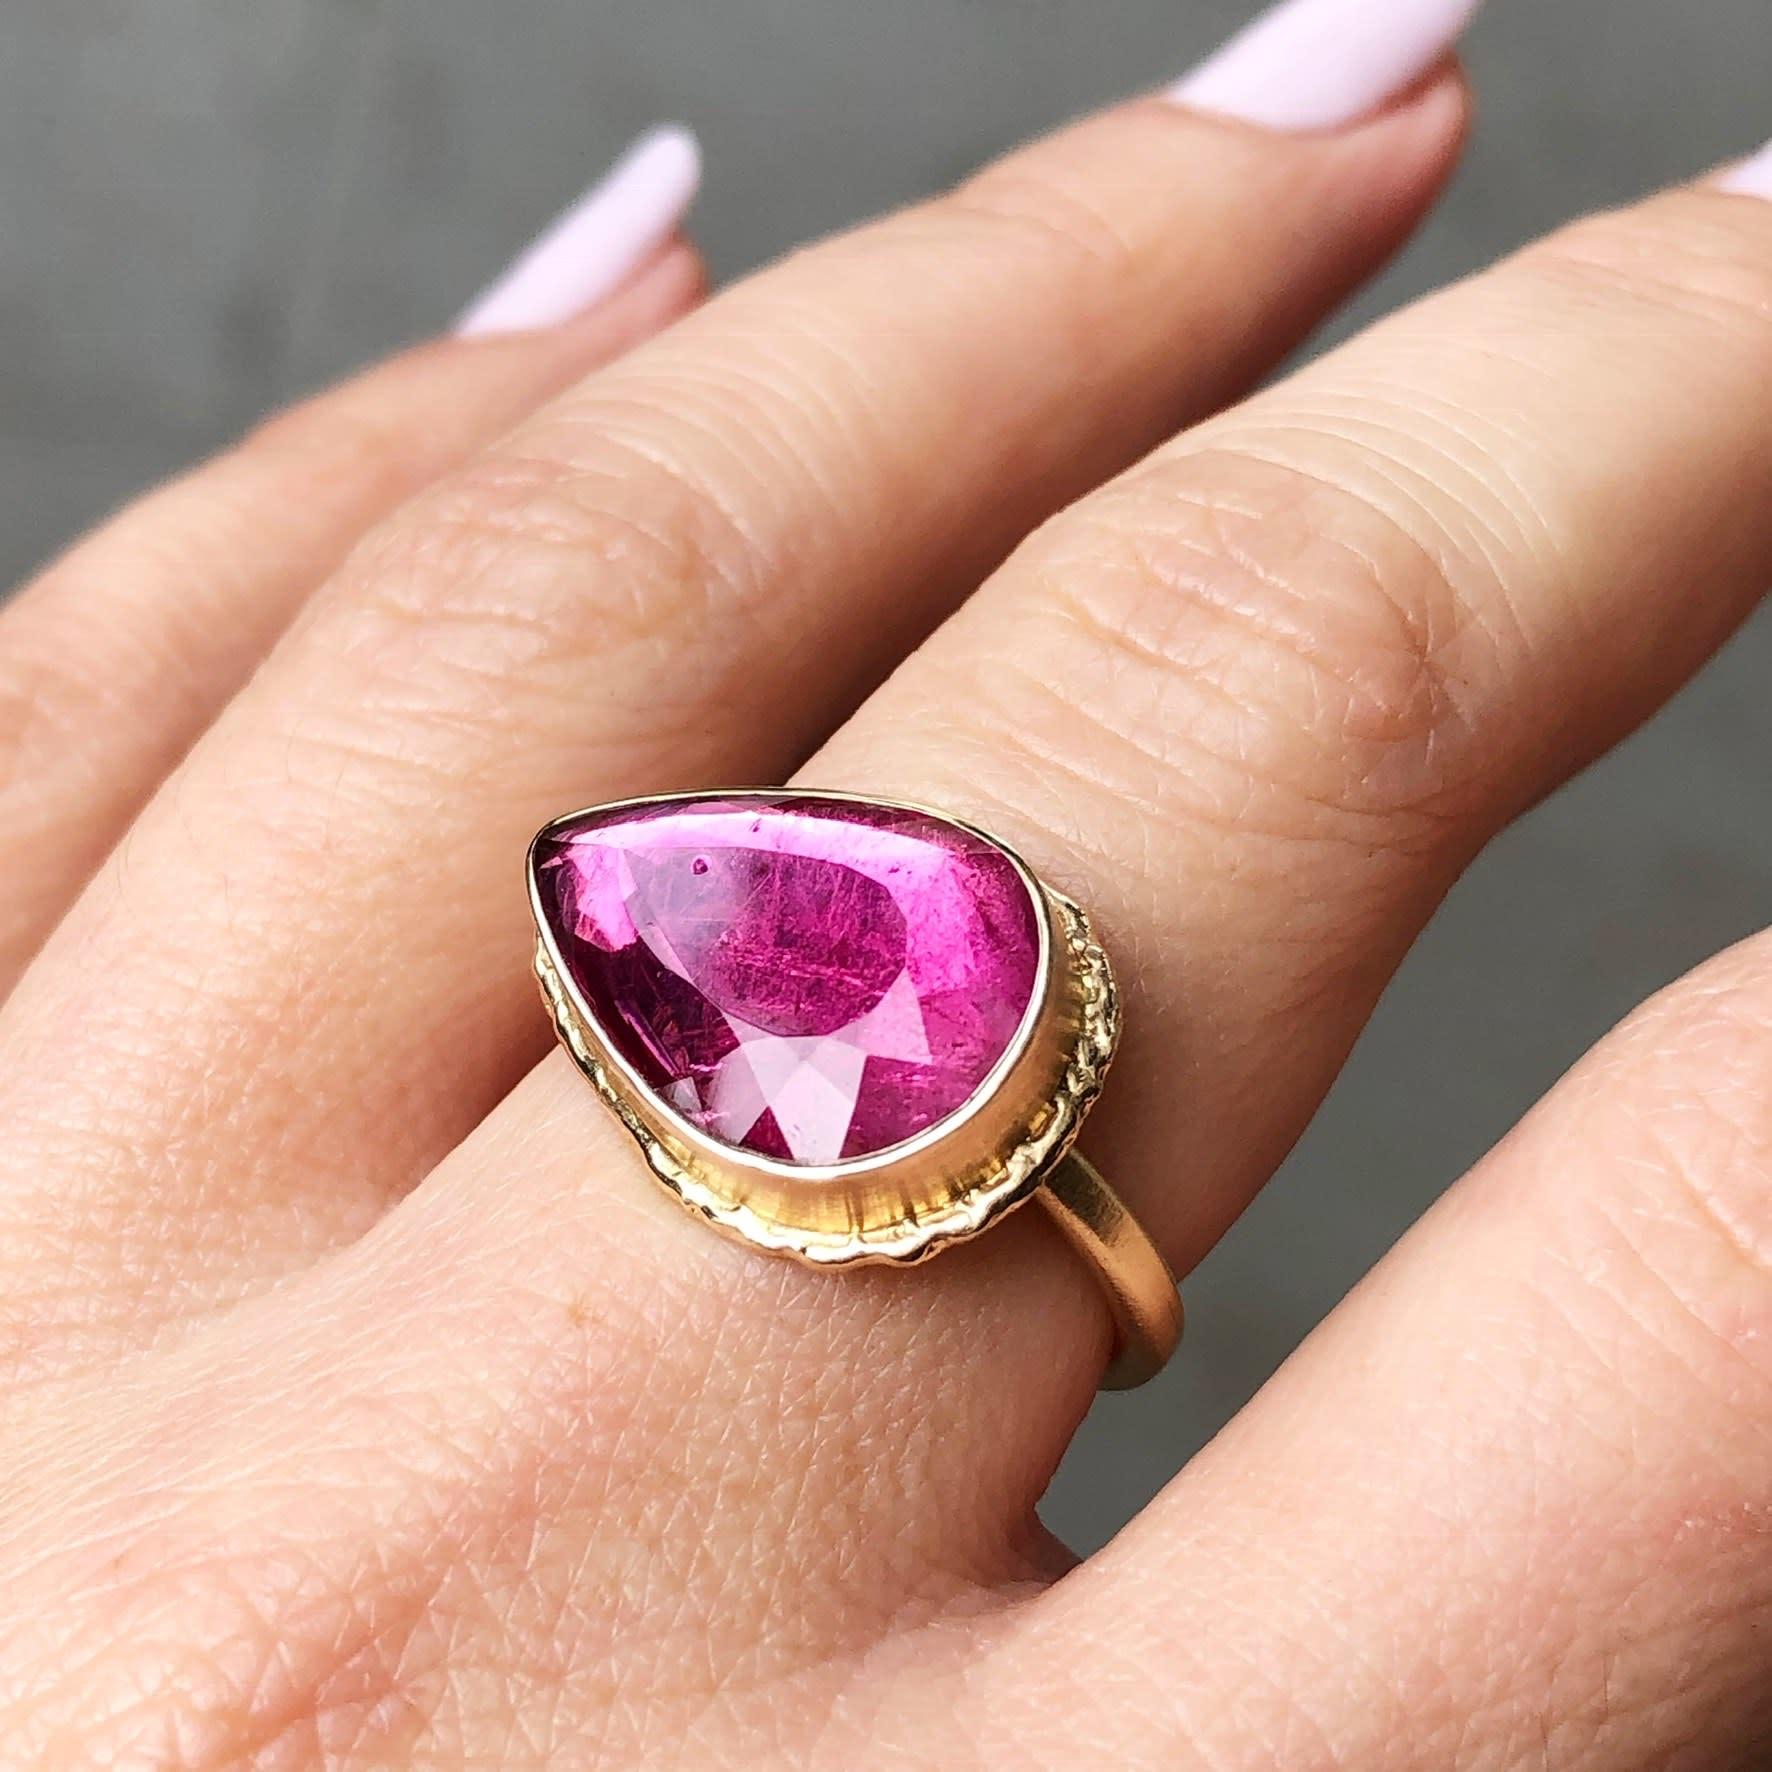 Jamie Joseph Jewelry Designs Pear Cut Rubellite Ring